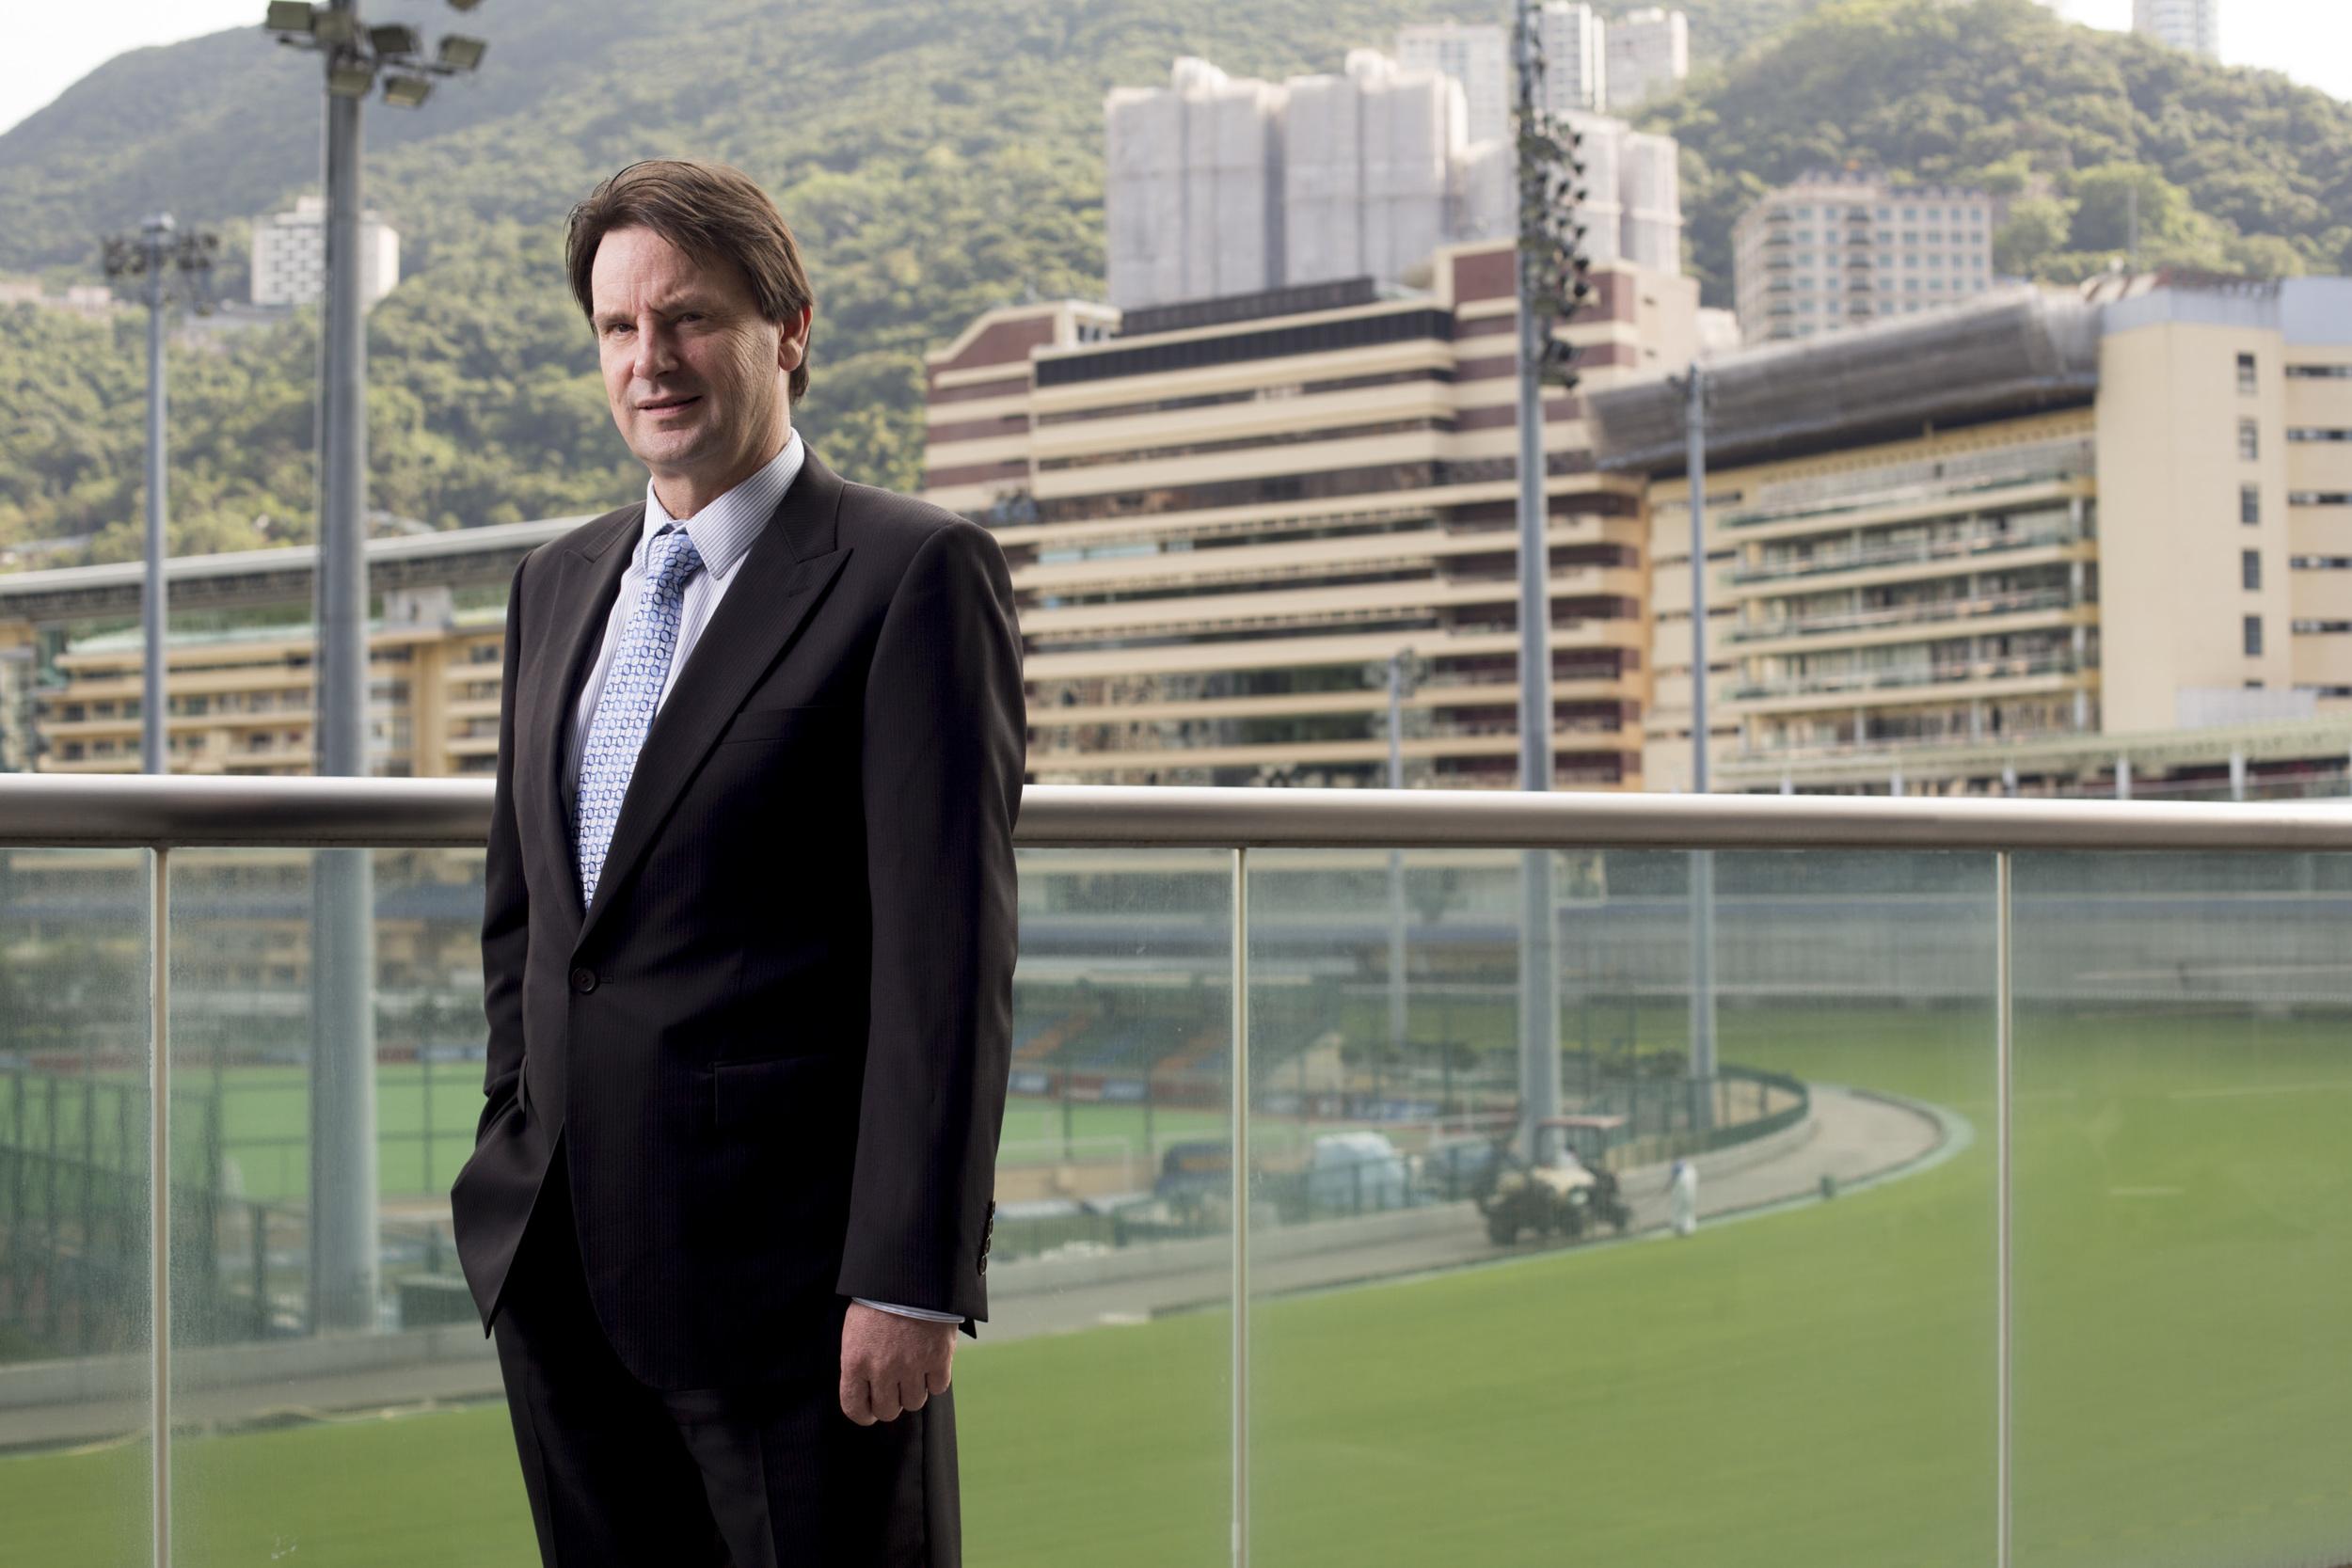 Ian Dickson, Head of Strategic Business Solutions at The Hong Kong Jockey Club